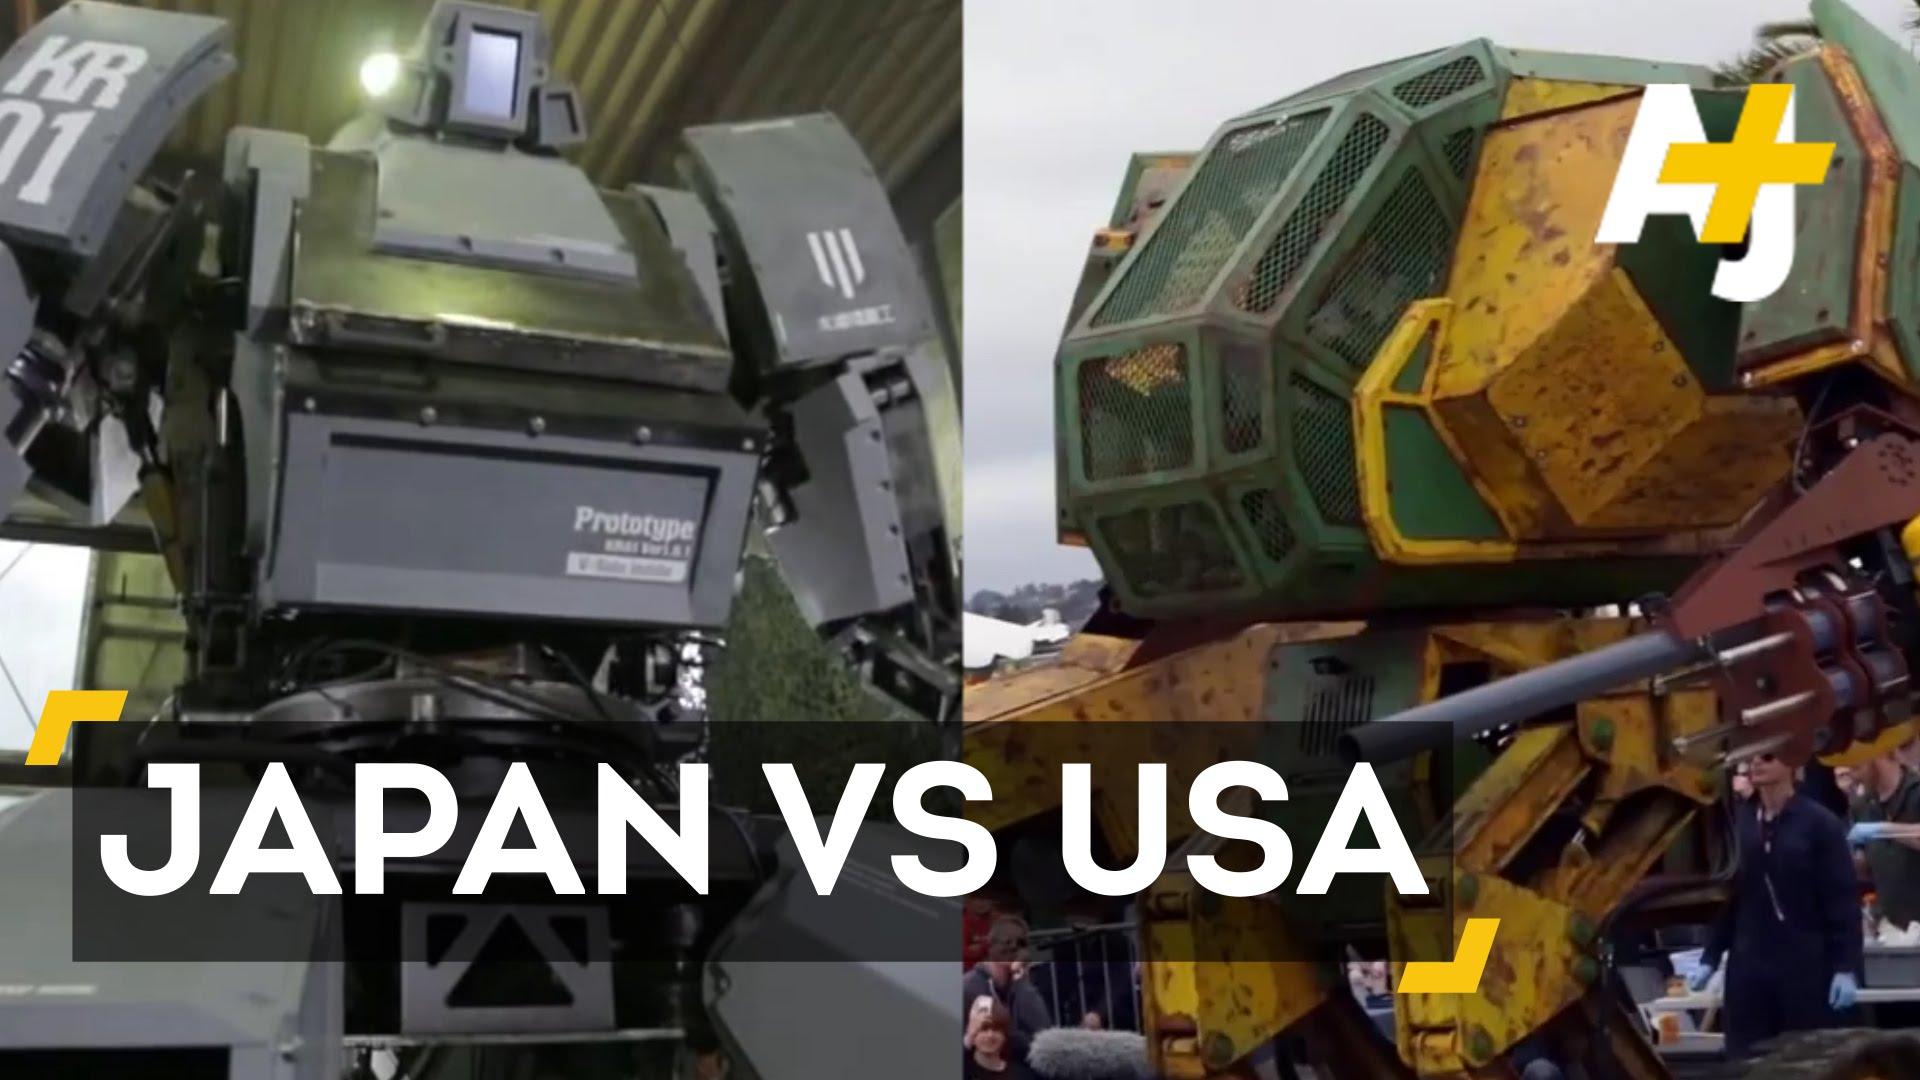 batalla-usa-japon-de-robots-gigantes